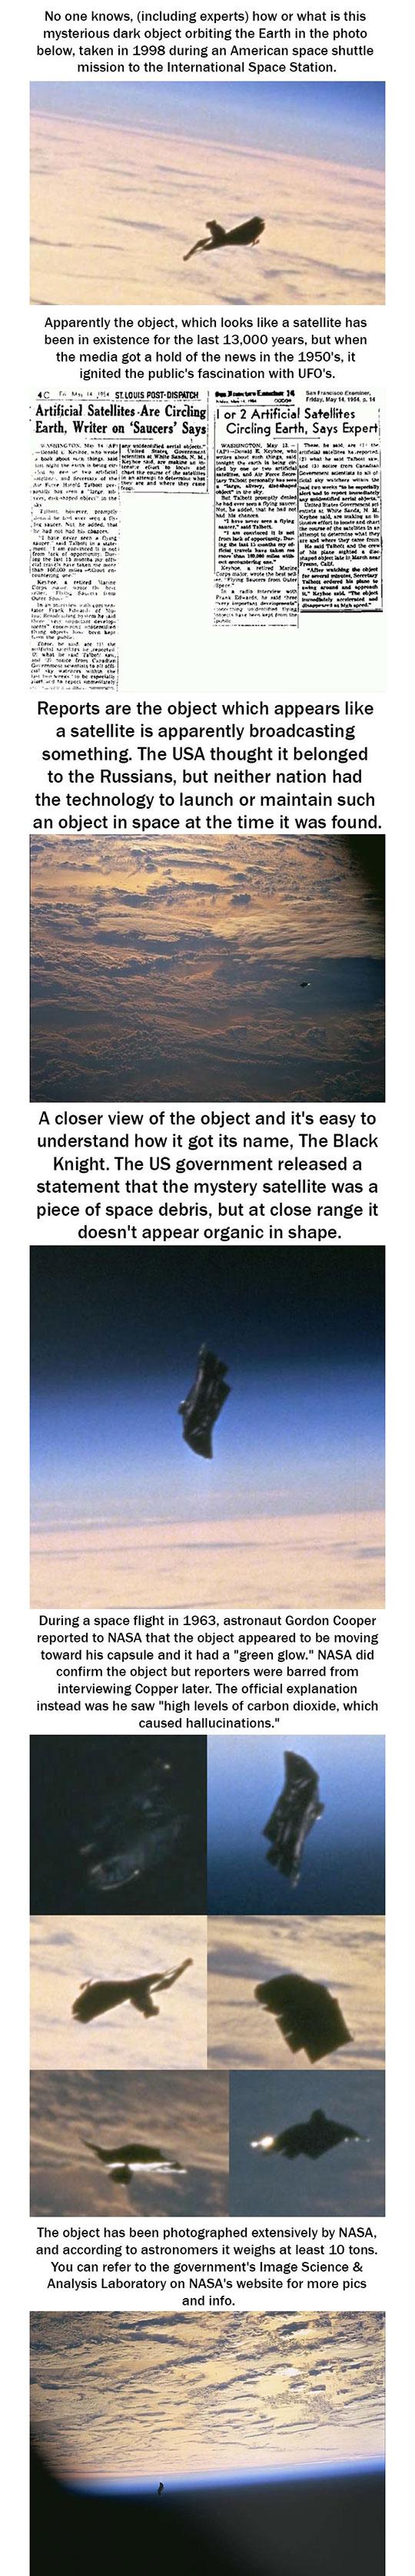 funny-alien-satellite-story-NASA-conspiracy